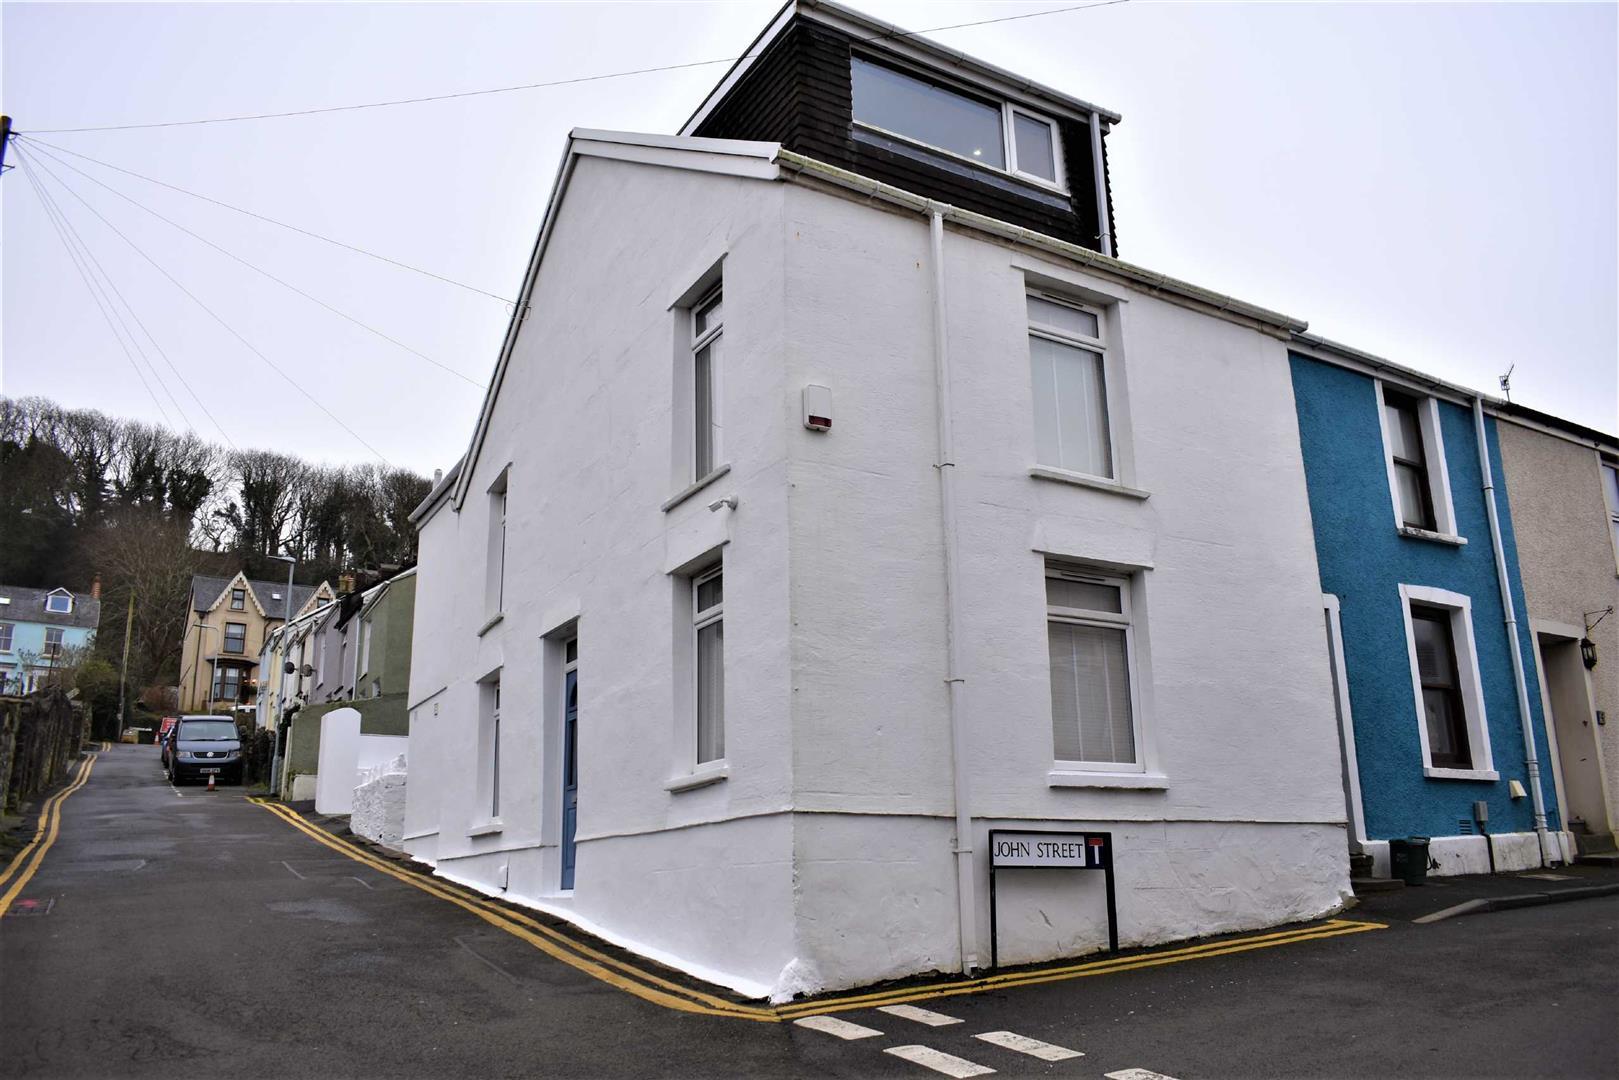 Gloucester Place, Mumbles, Swansea, SA3 4LQ